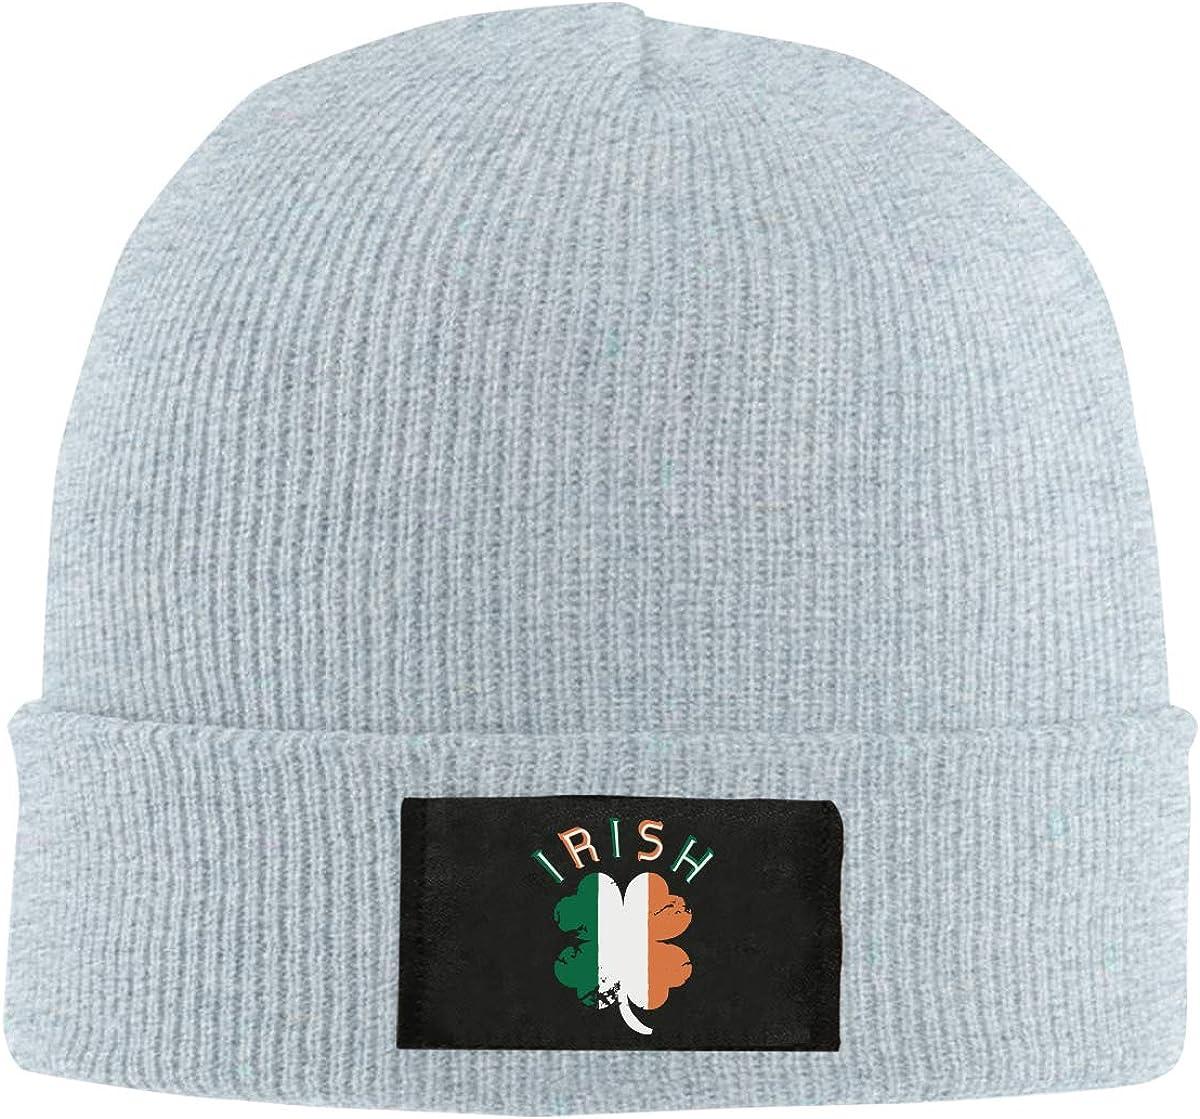 BF5Y6z/&MA Unisex Irish Flag Shamrock Knitted Cap 100/% Acrylic Daily Beanies Cap